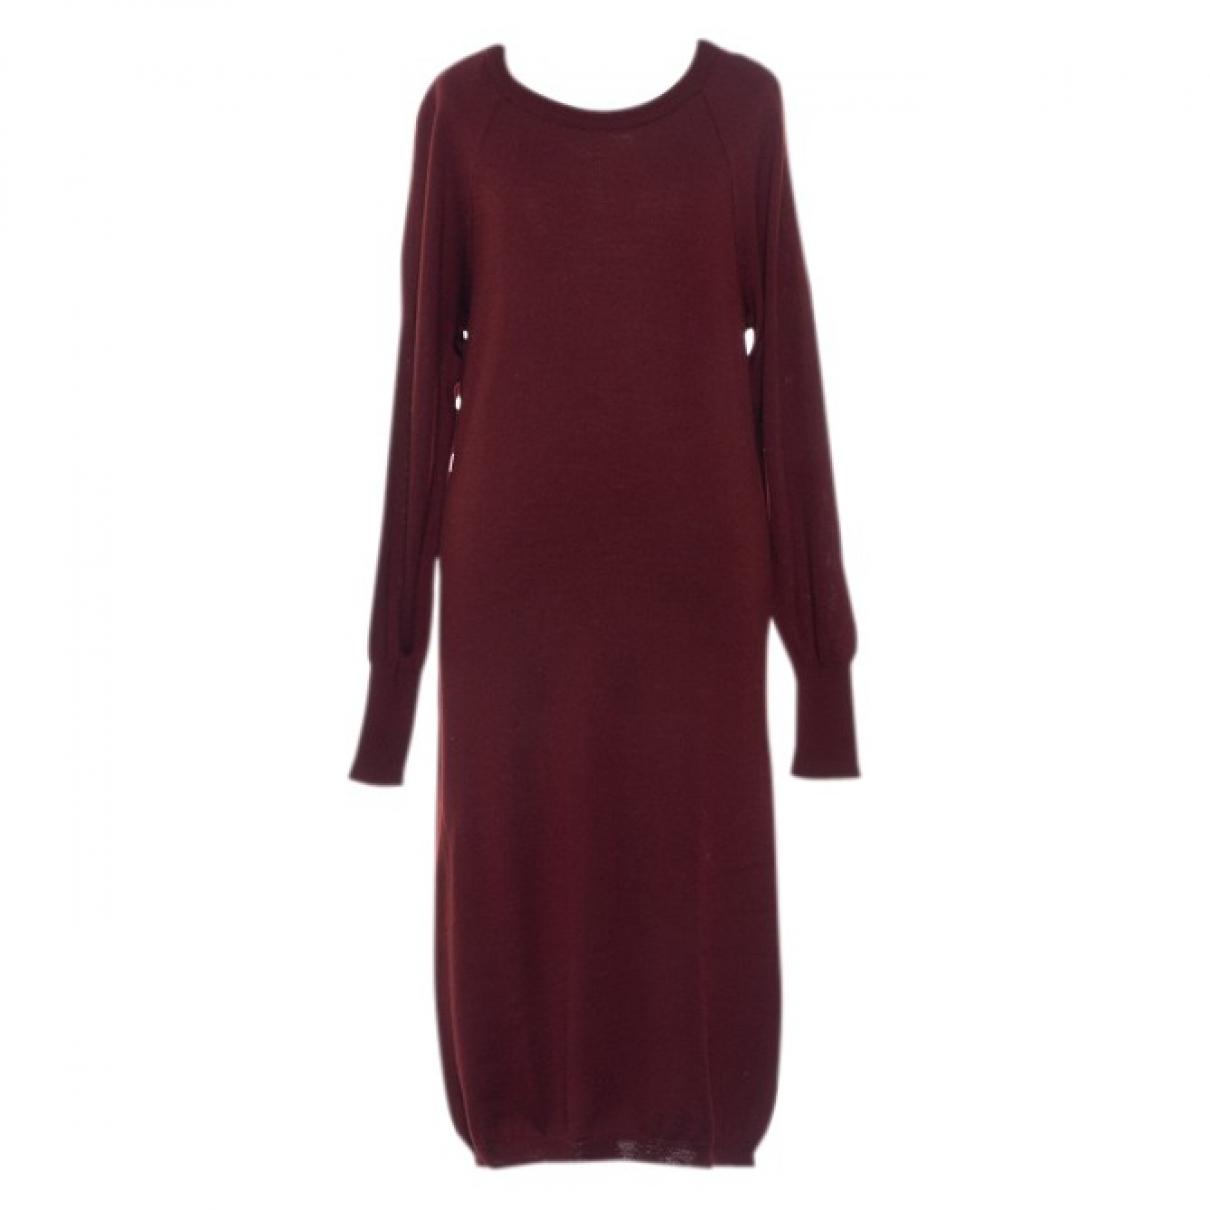 Mm6 \N Burgundy Wool dress for Women S International